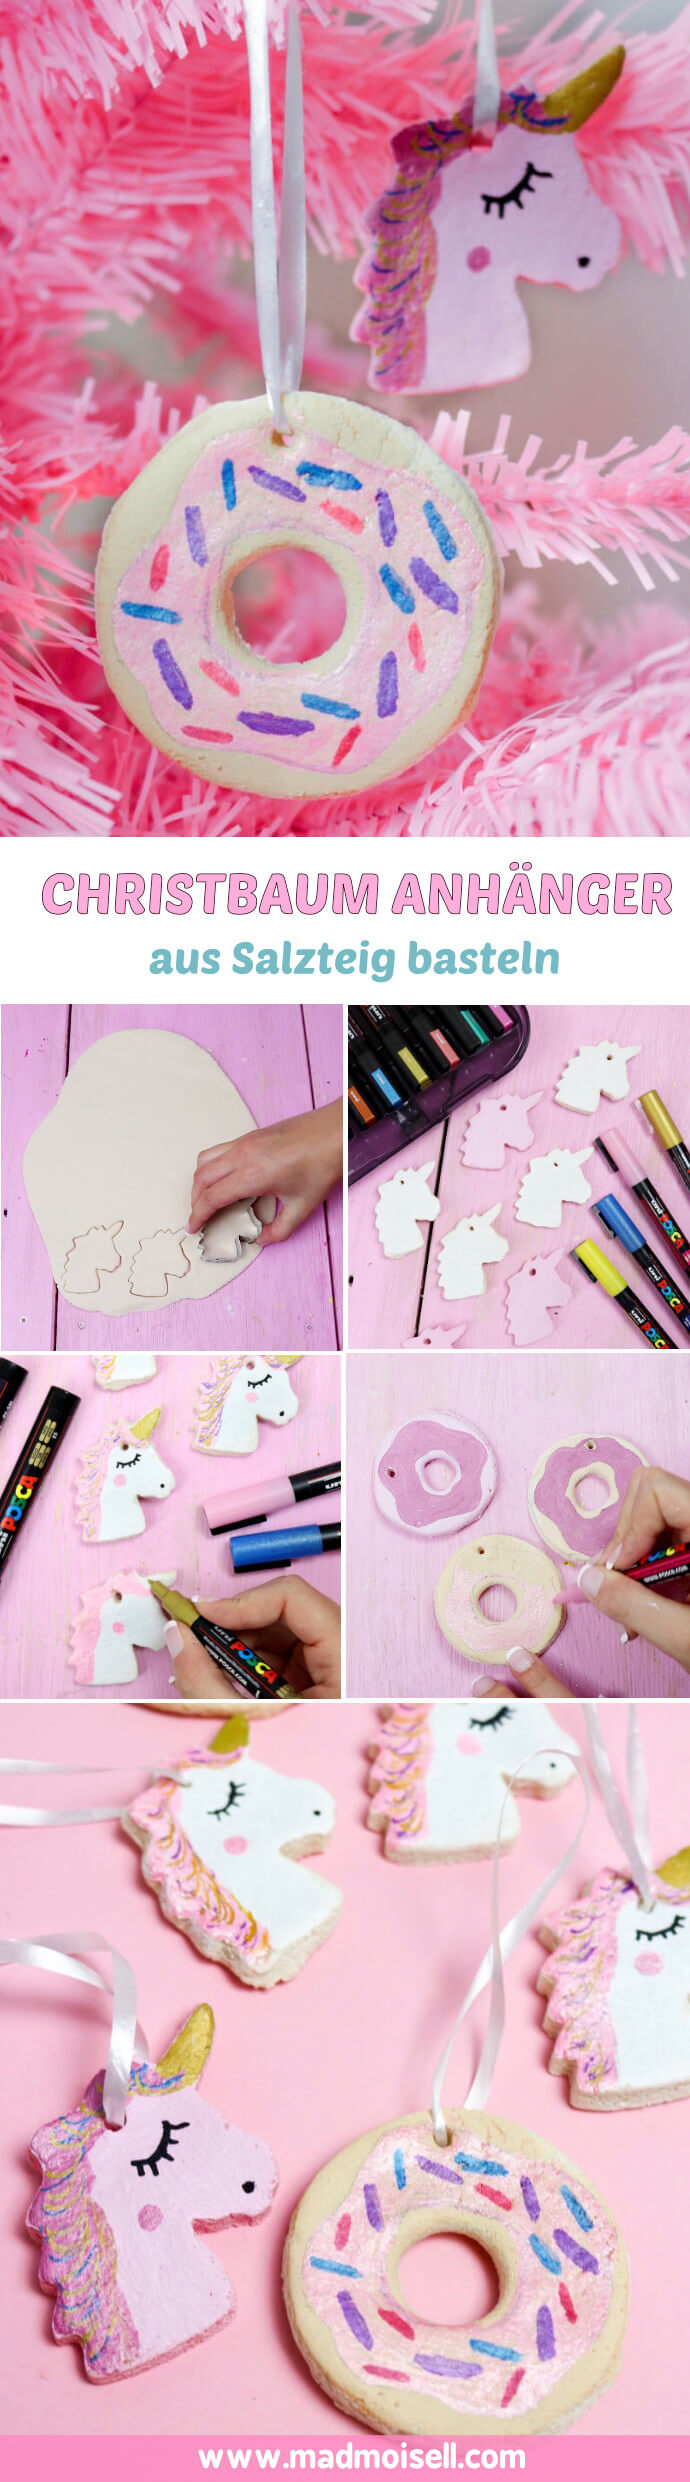 Diy Einhorn Christbaum Anhänger Selber Machen 2 Kreative Diy